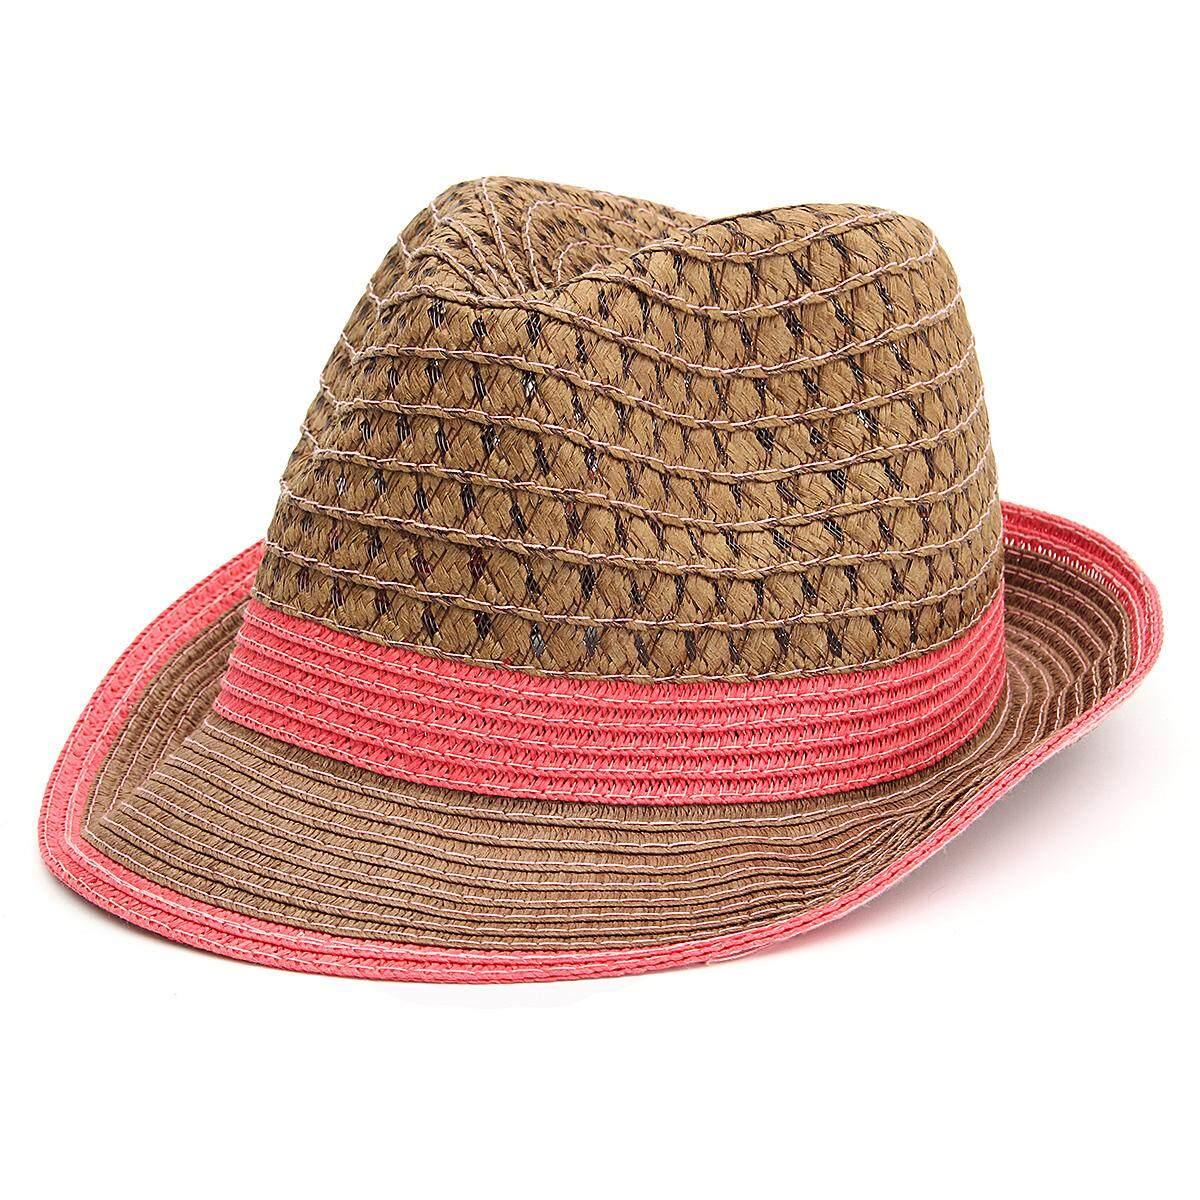 Trendi Musim Panas Topi Jerami Berongga Linen Jazz Topi Shading Matahari  Topi Pantai Penting Merah- 4c04fd3899